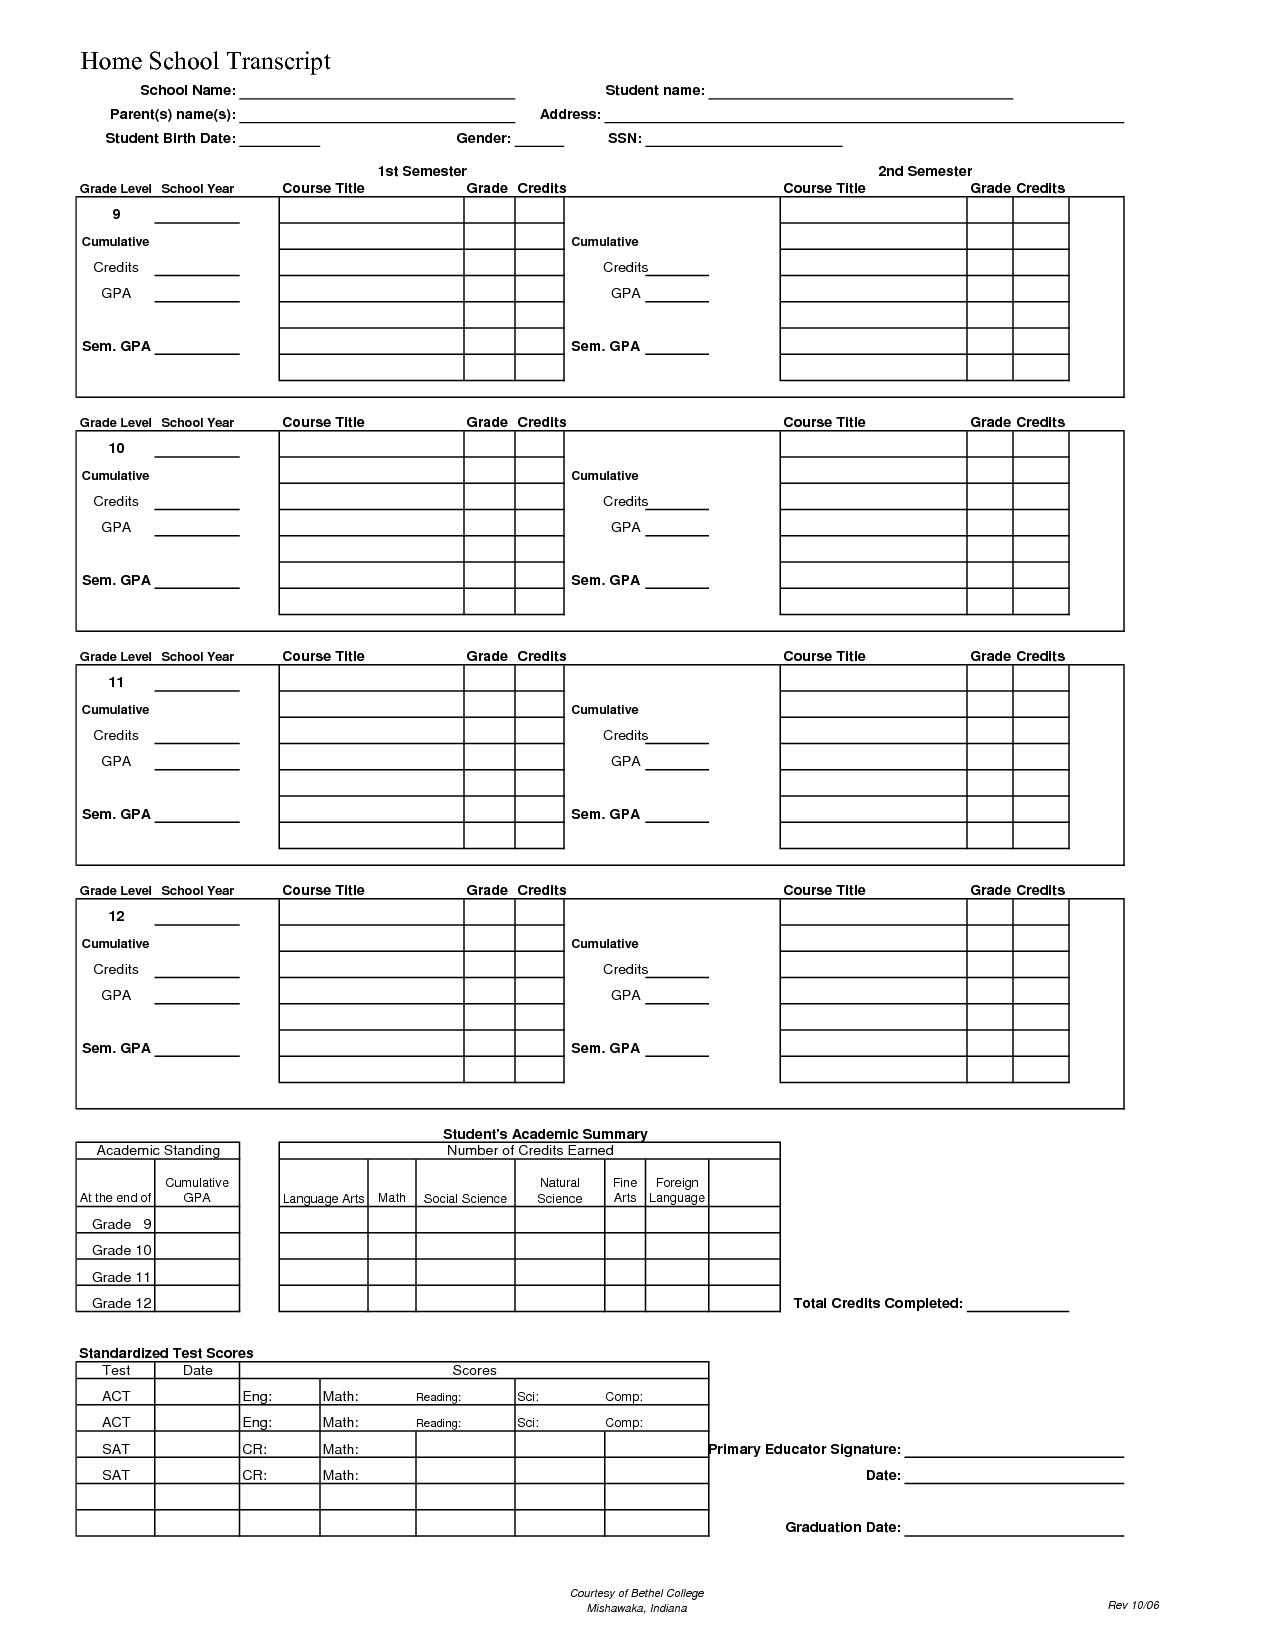 Template For Homeschool High School Transcript Printable